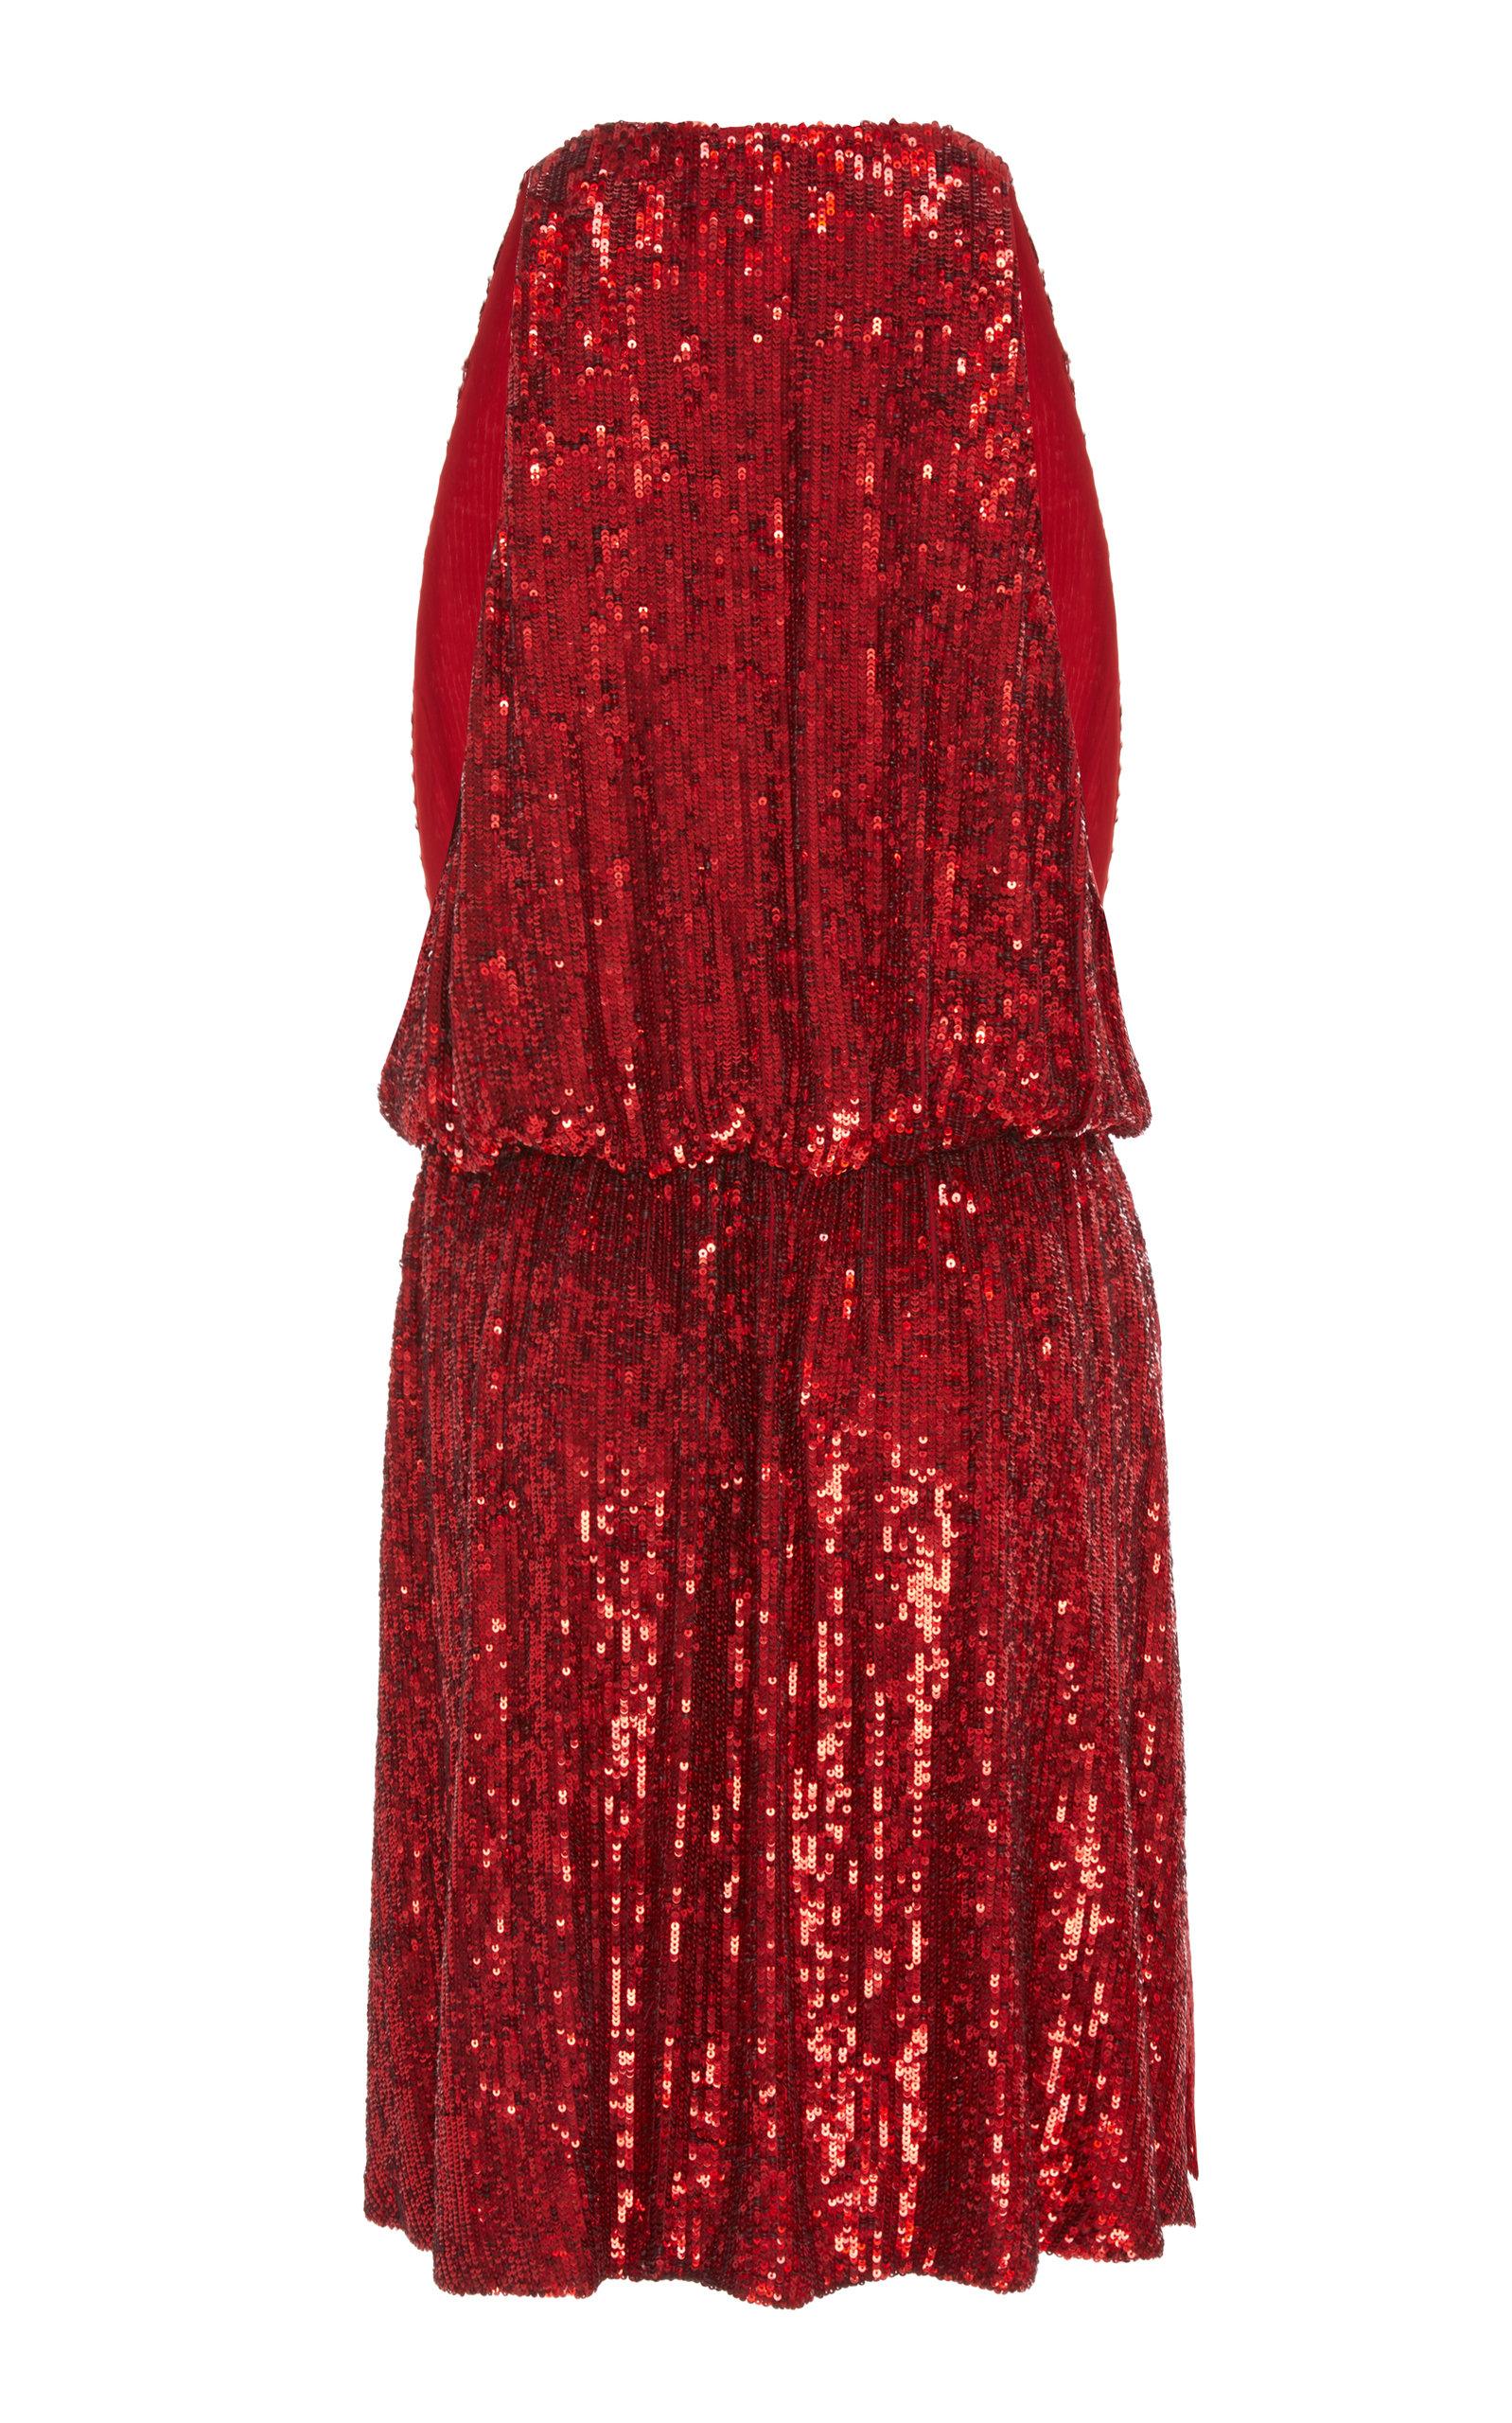 Mina Plunge Dress by Caroline Constas